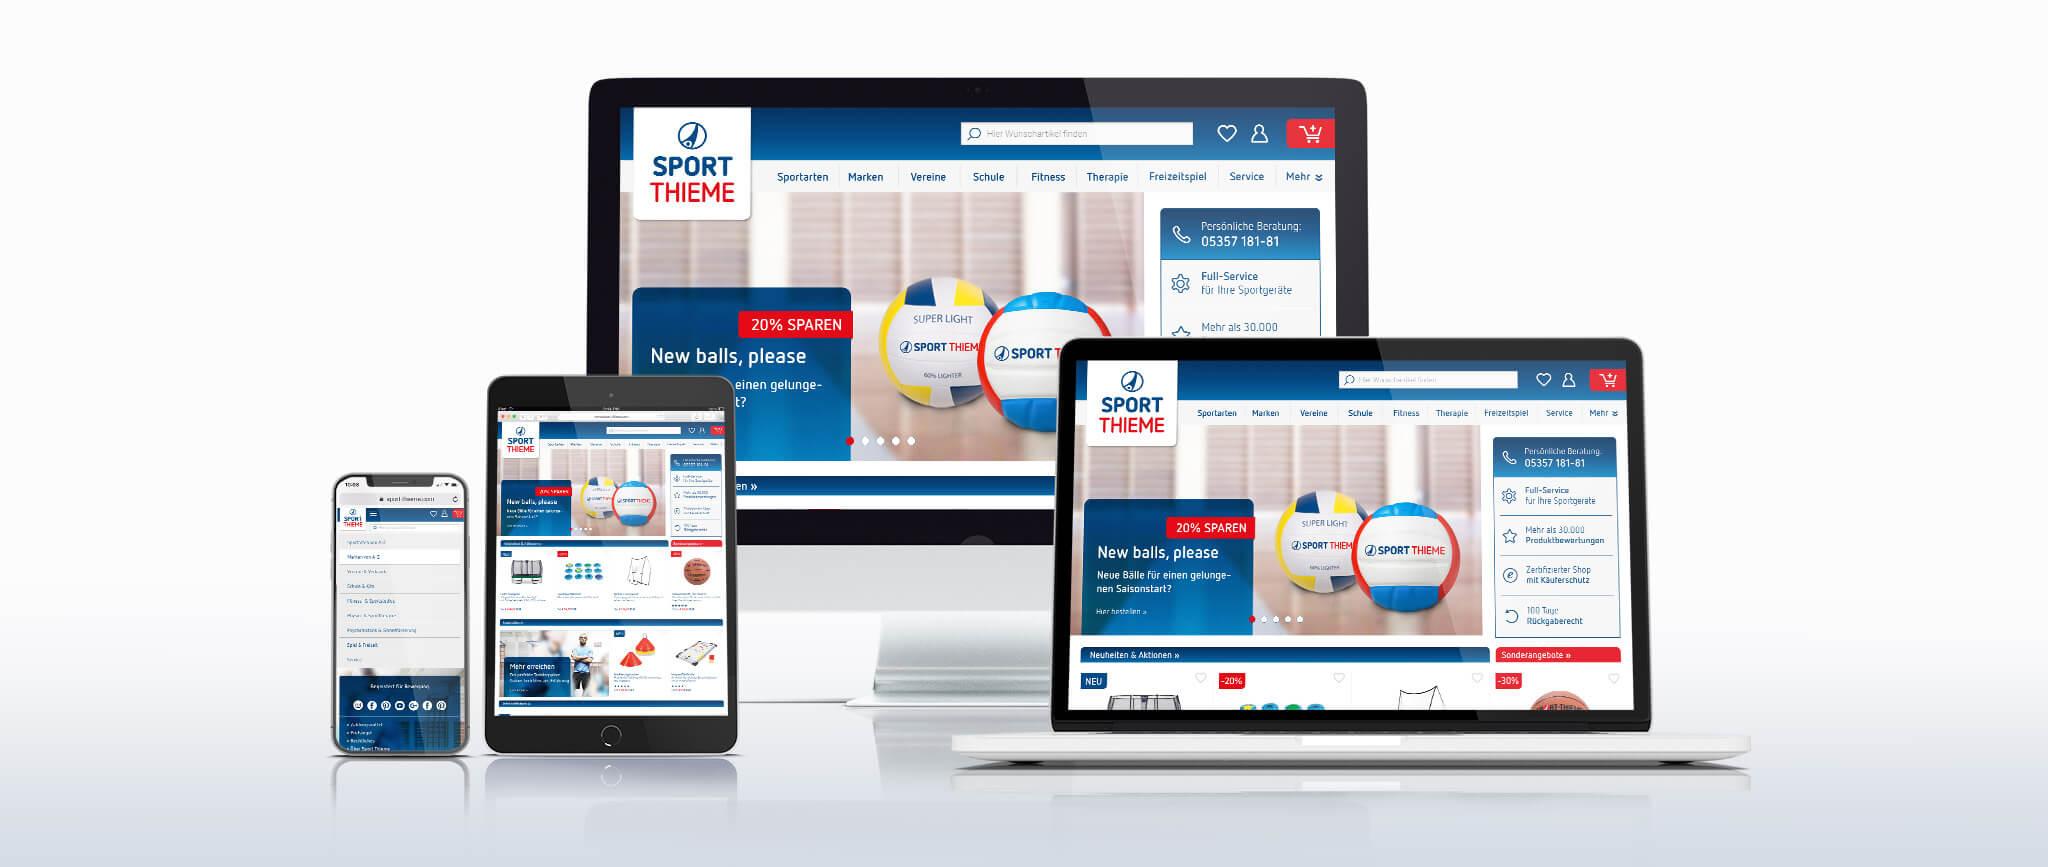 Sport-Thieme Corporate Design Studie: Online Medien